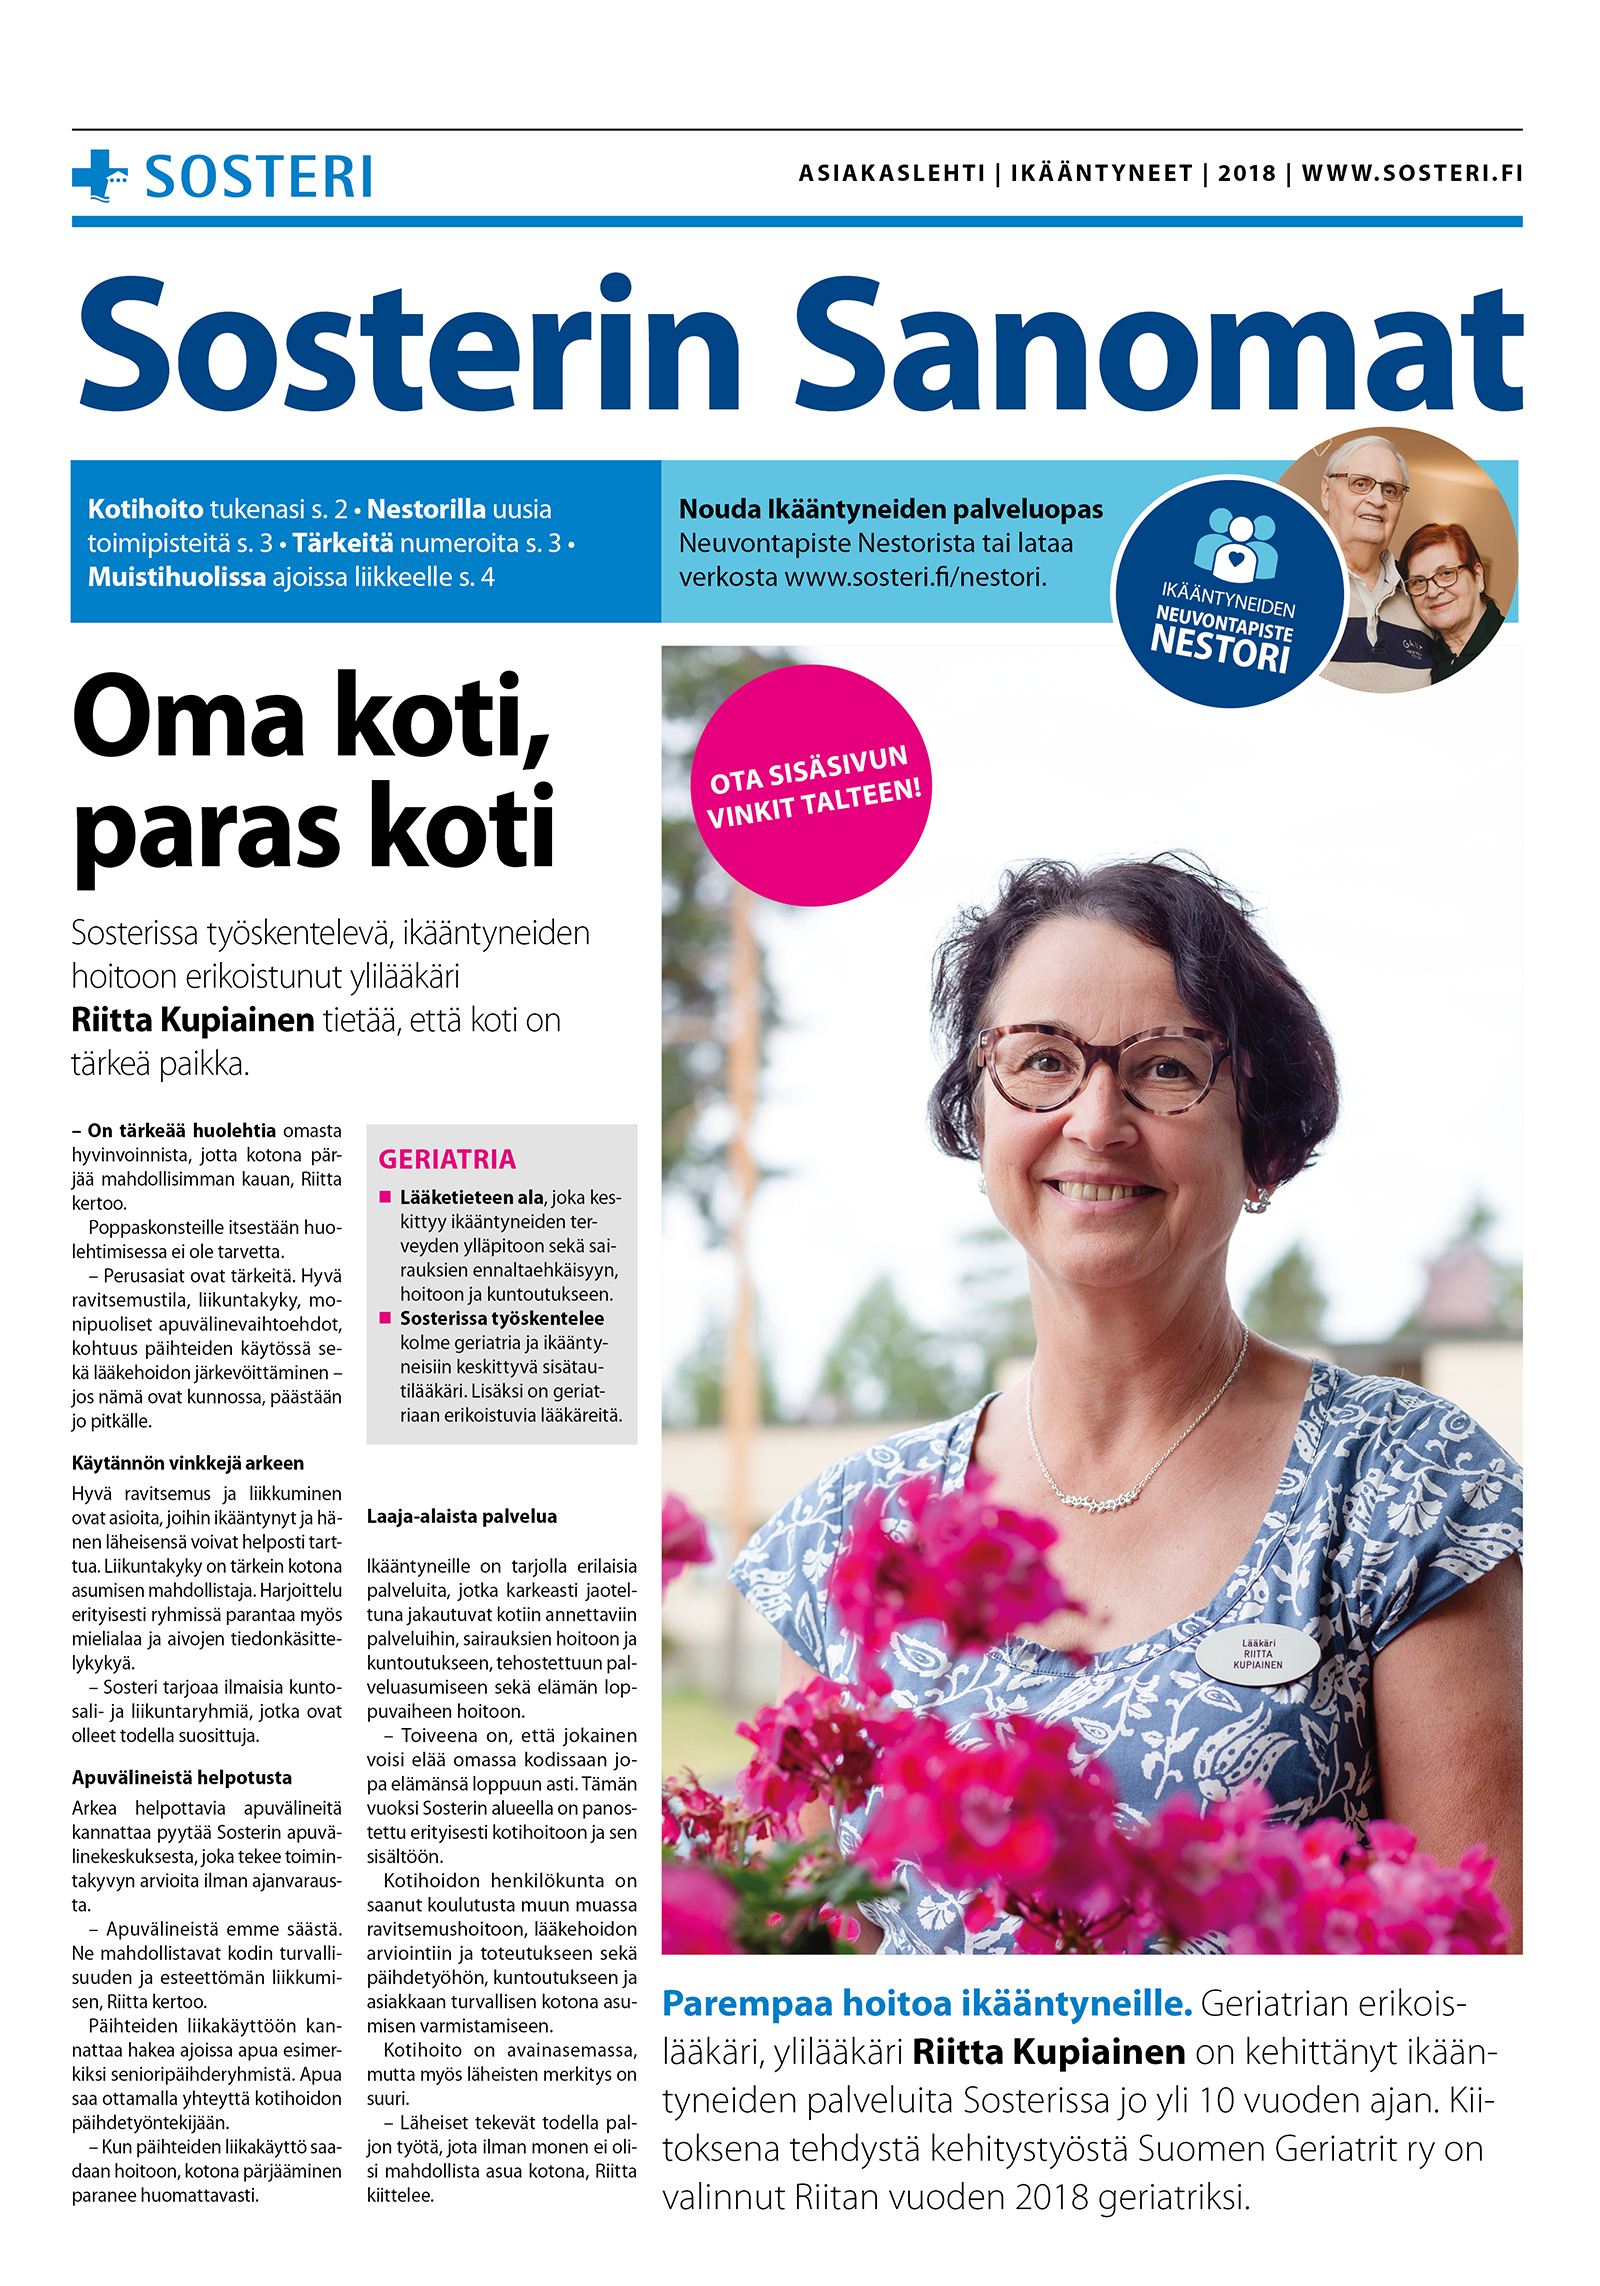 SosterinSanomat_IS_1409